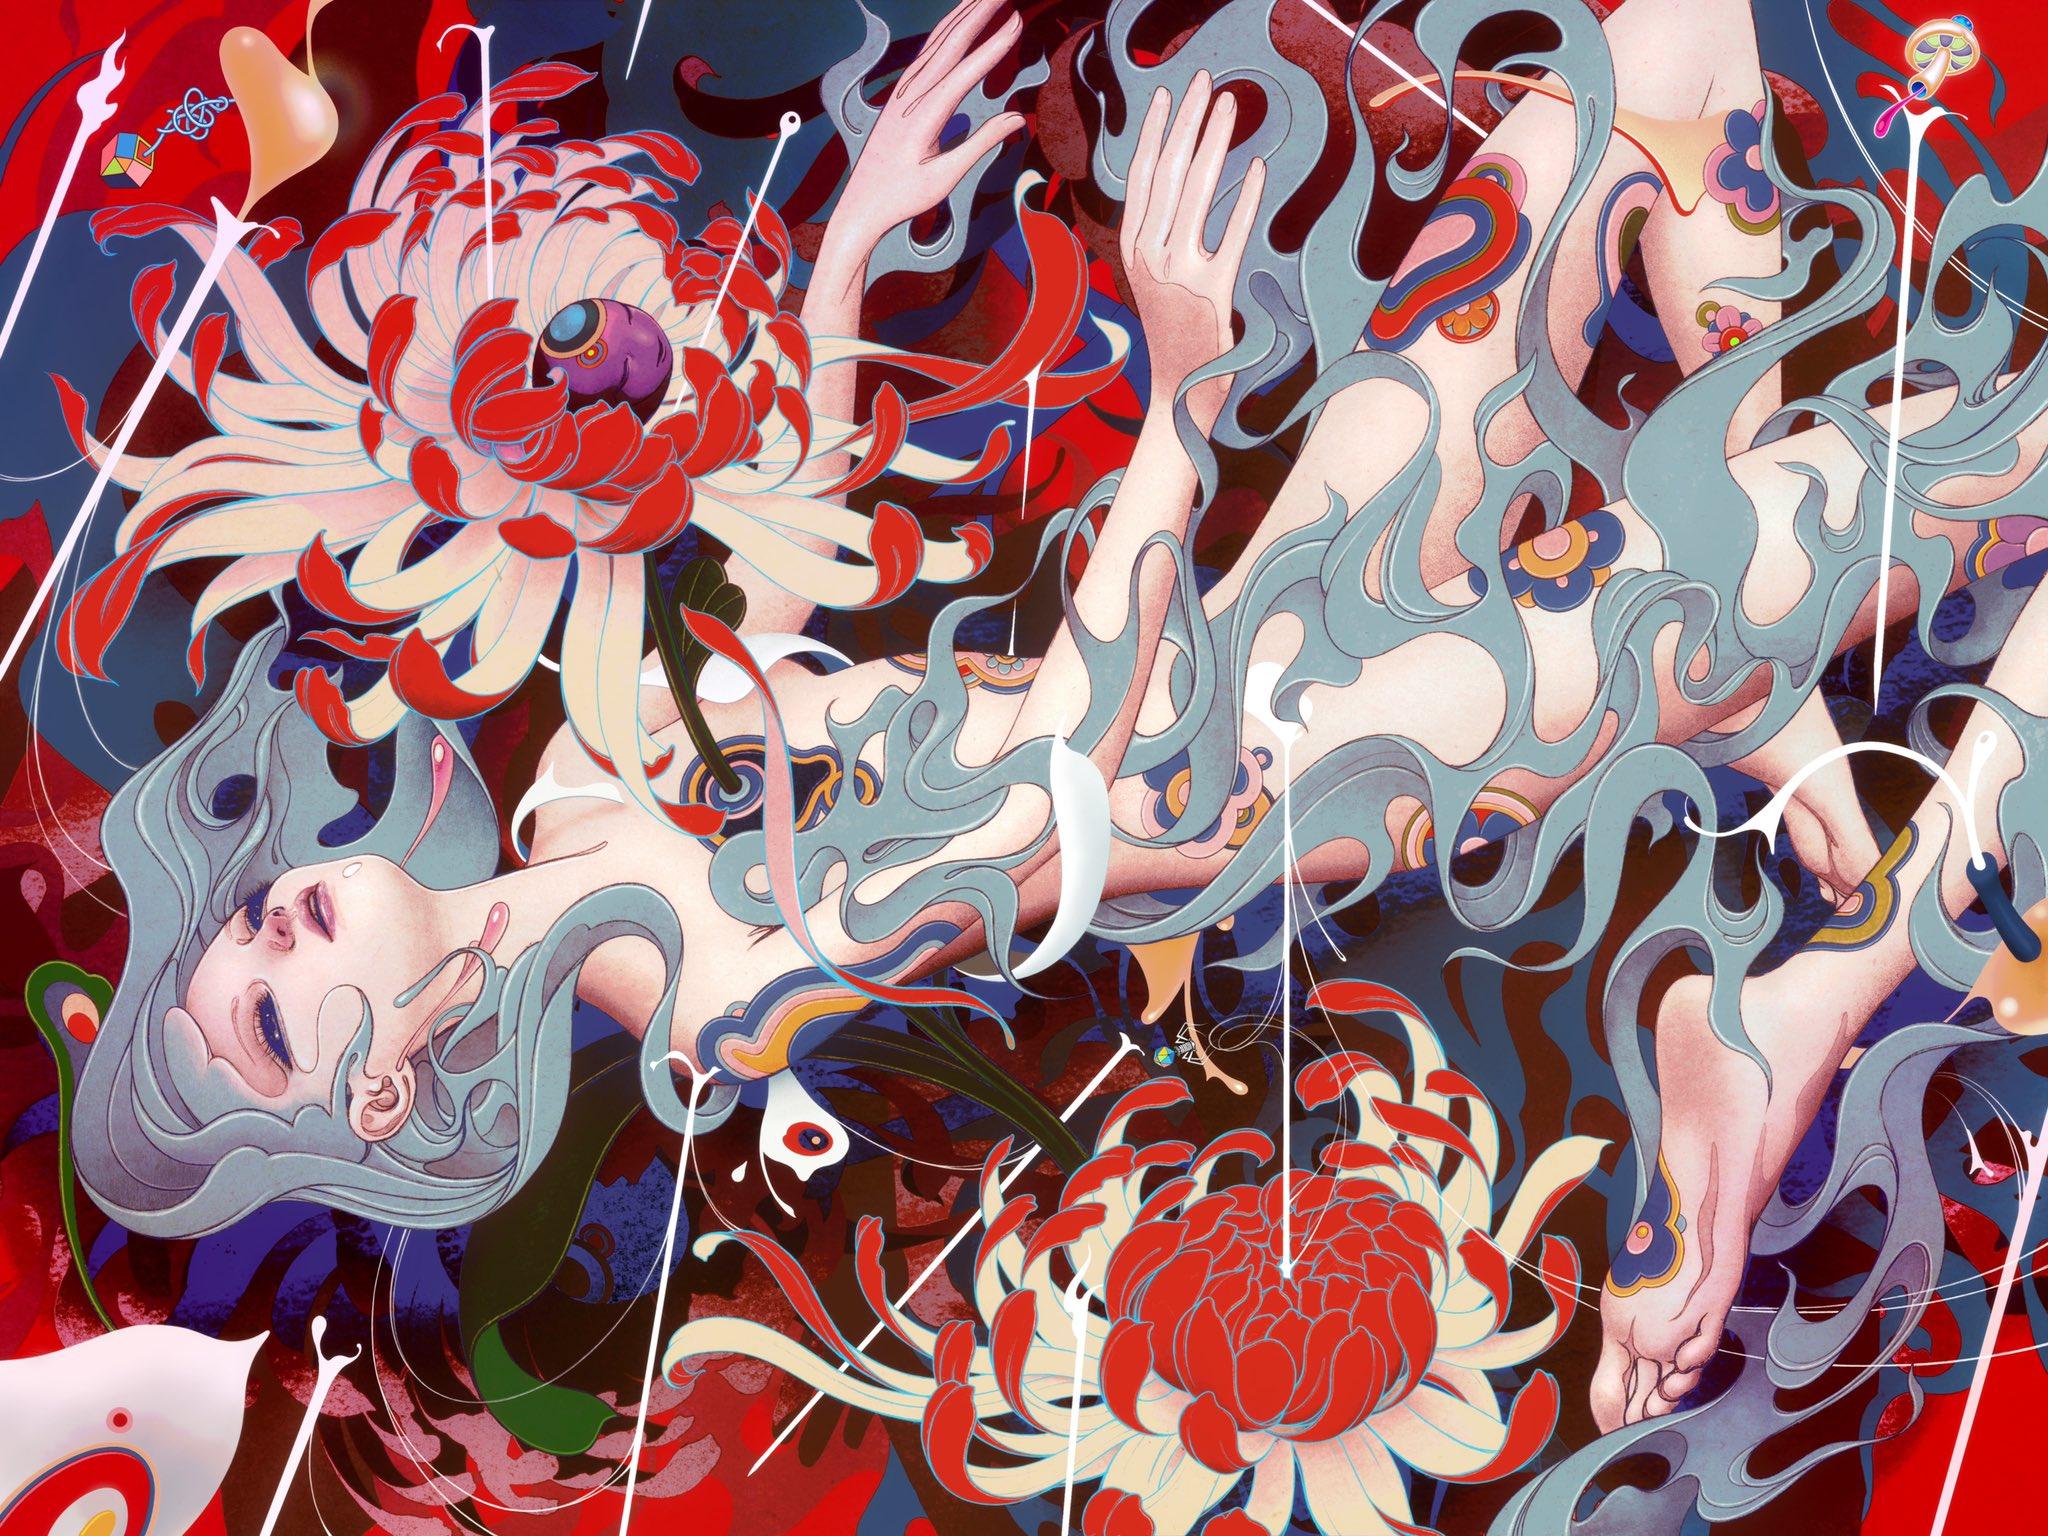 James Jean On Twitter Chrysanthemum Digital 6000x4500